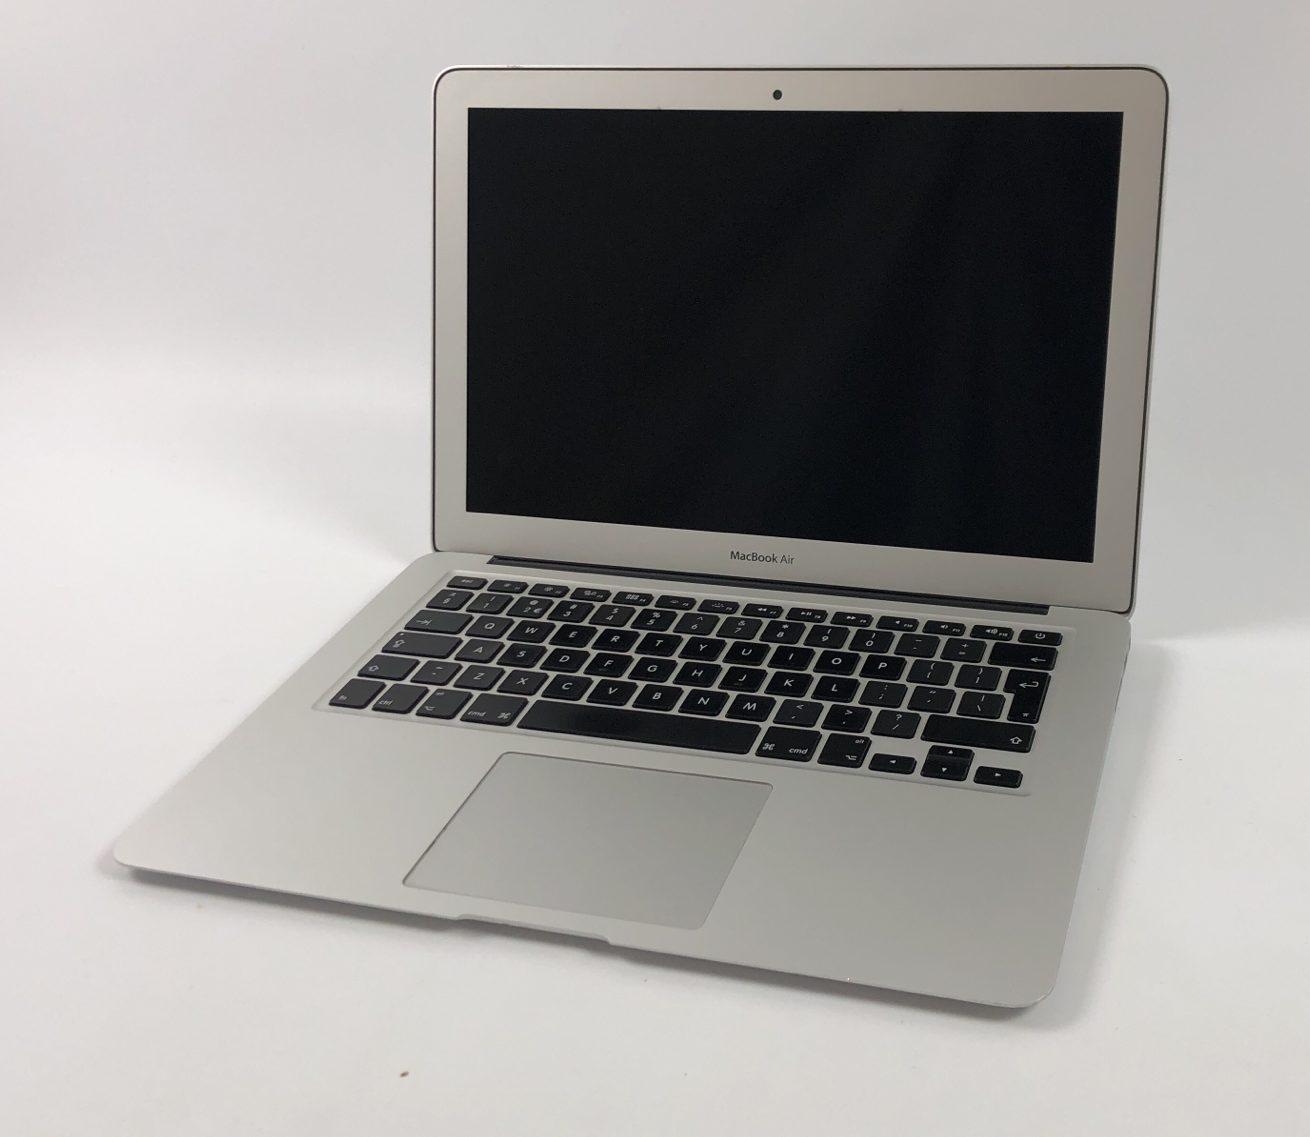 "MacBook Air 13"" Early 2015 (Intel Core i5 1.6 GHz 8 GB RAM 256 GB SSD), Intel Core i5 1.6 GHz, 8 GB RAM, 256 GB SSD, Afbeelding 1"